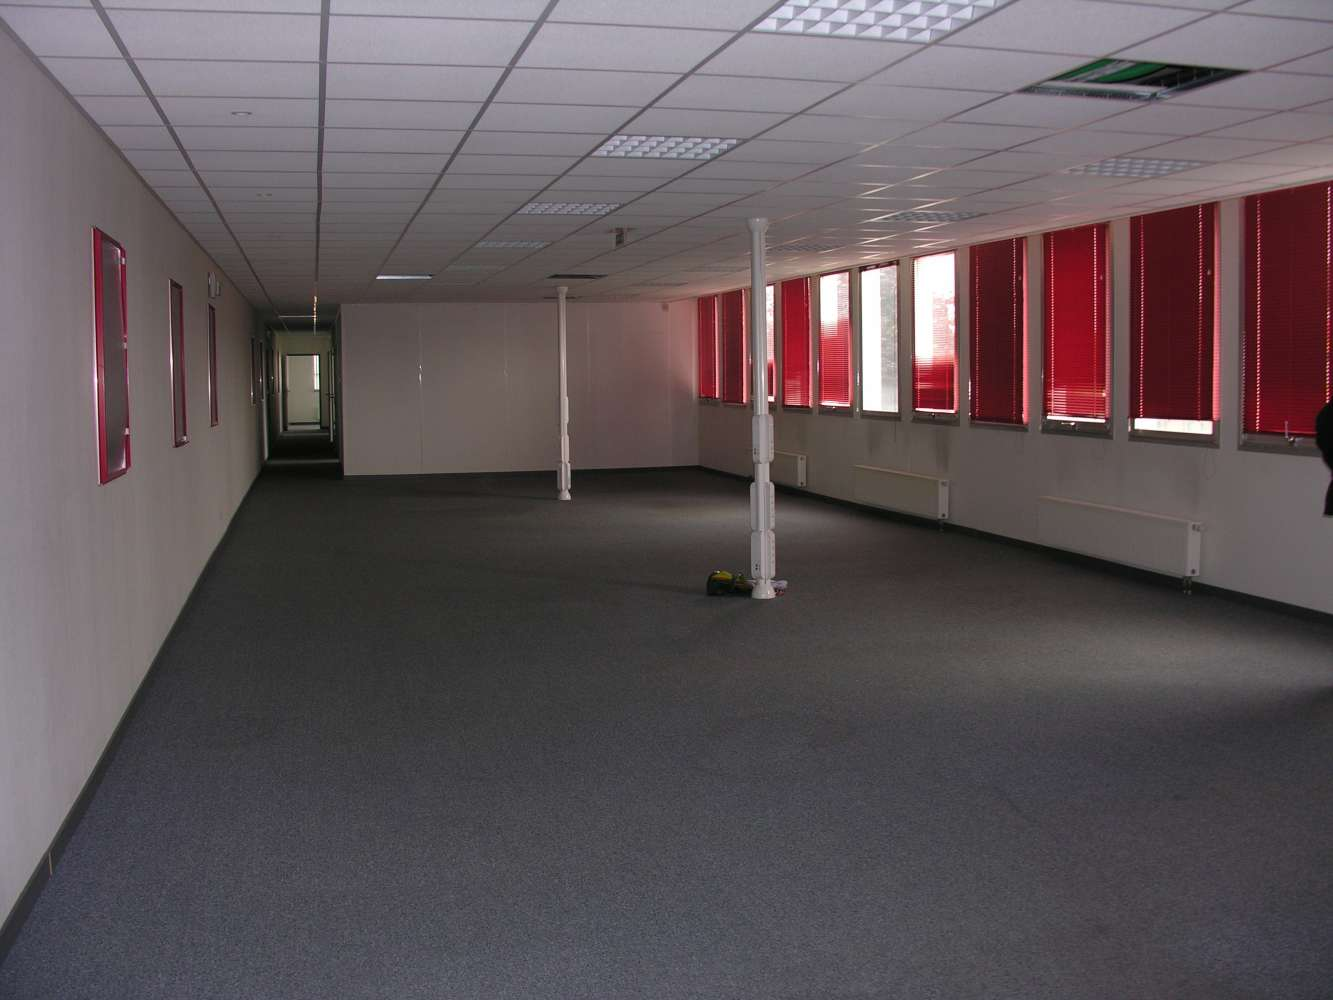 Activités/entrepôt Reims, 51100 - 8 RUE ANDRÉ HUET - 488593